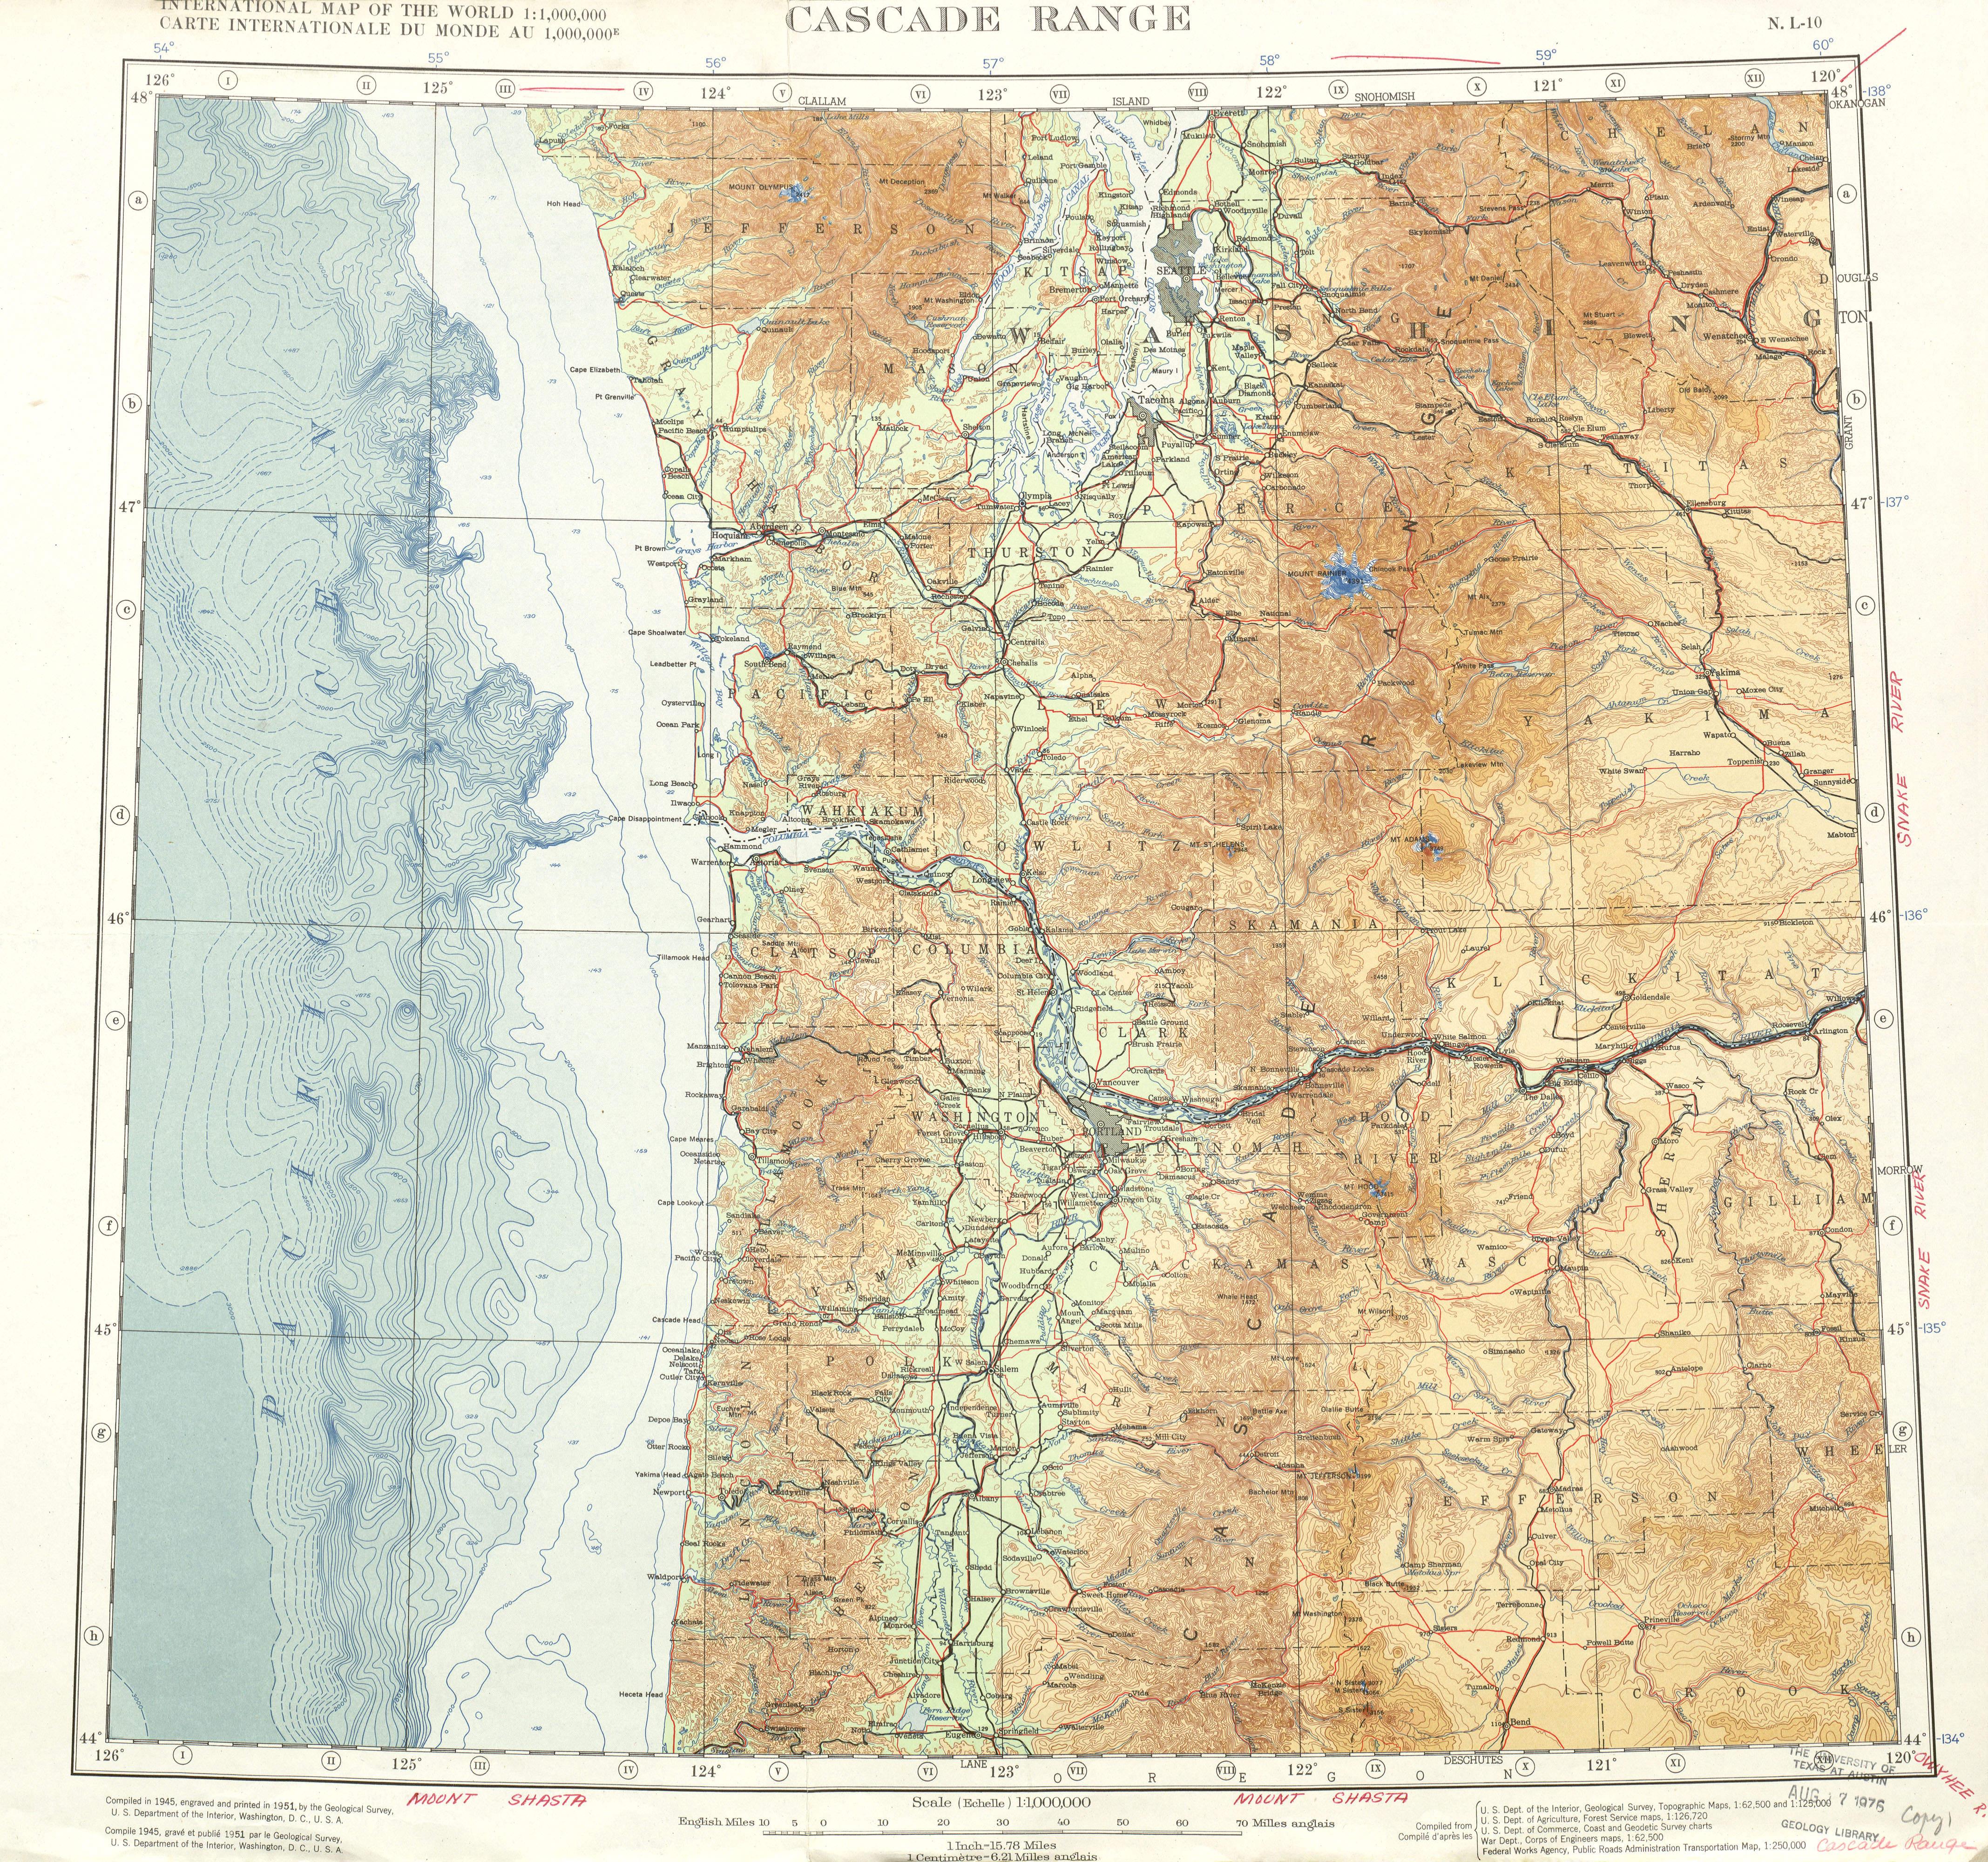 Cascade Range Map - View Online on